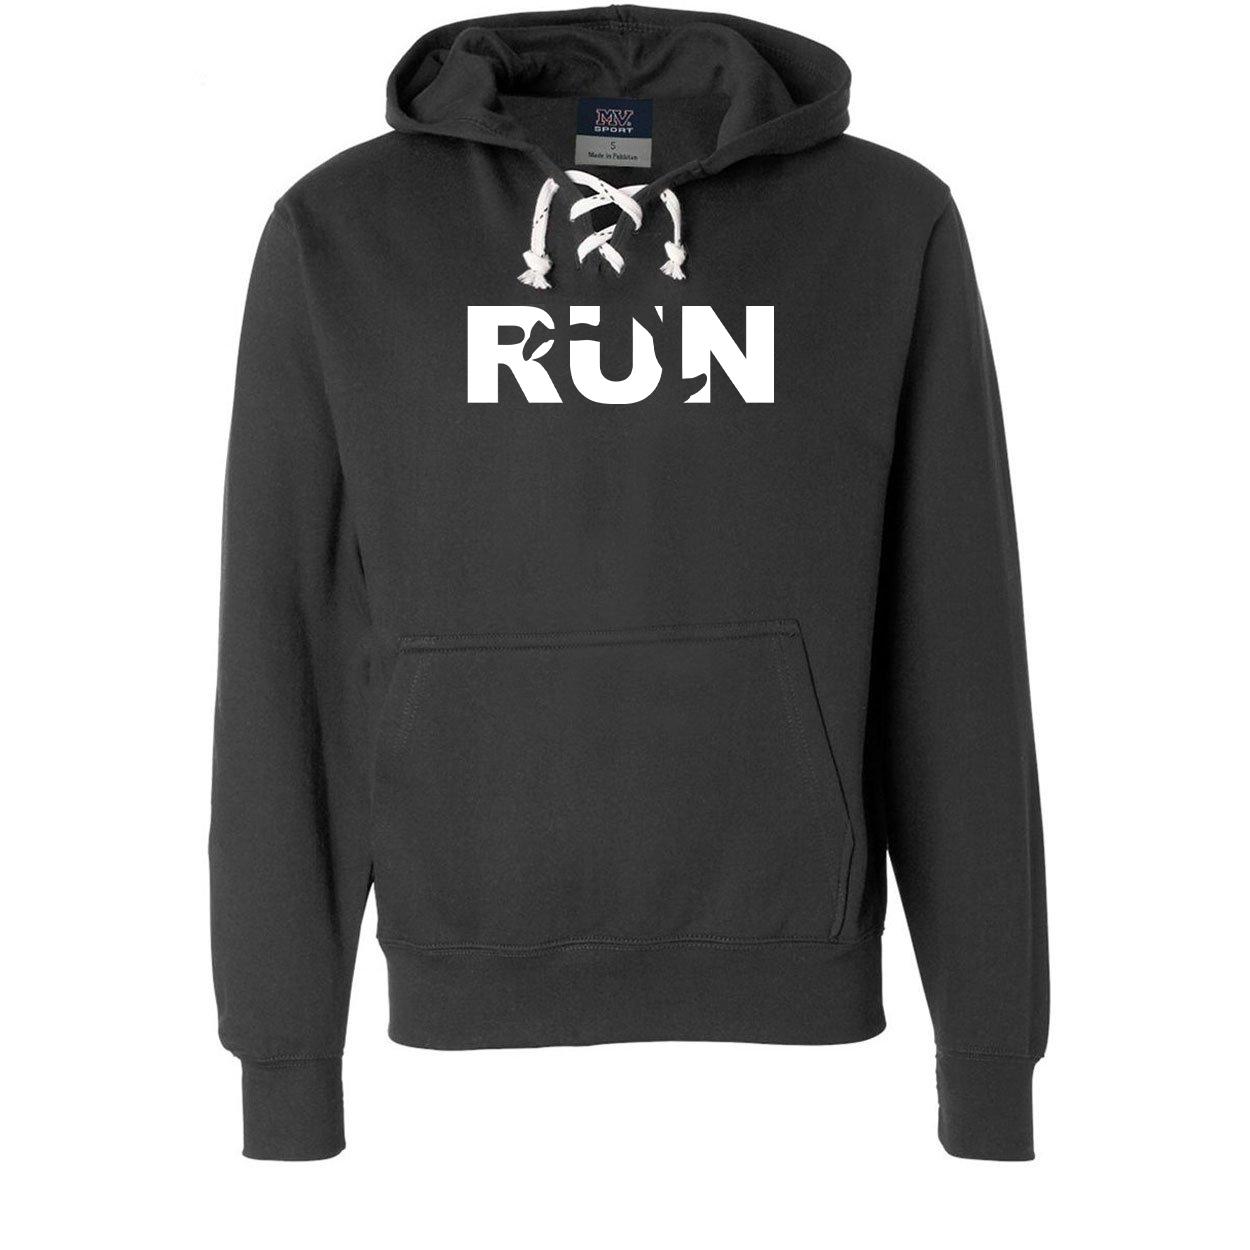 Run Jog Logo Classic Unisex Premium Hockey Sweatshirt Black (White Logo)